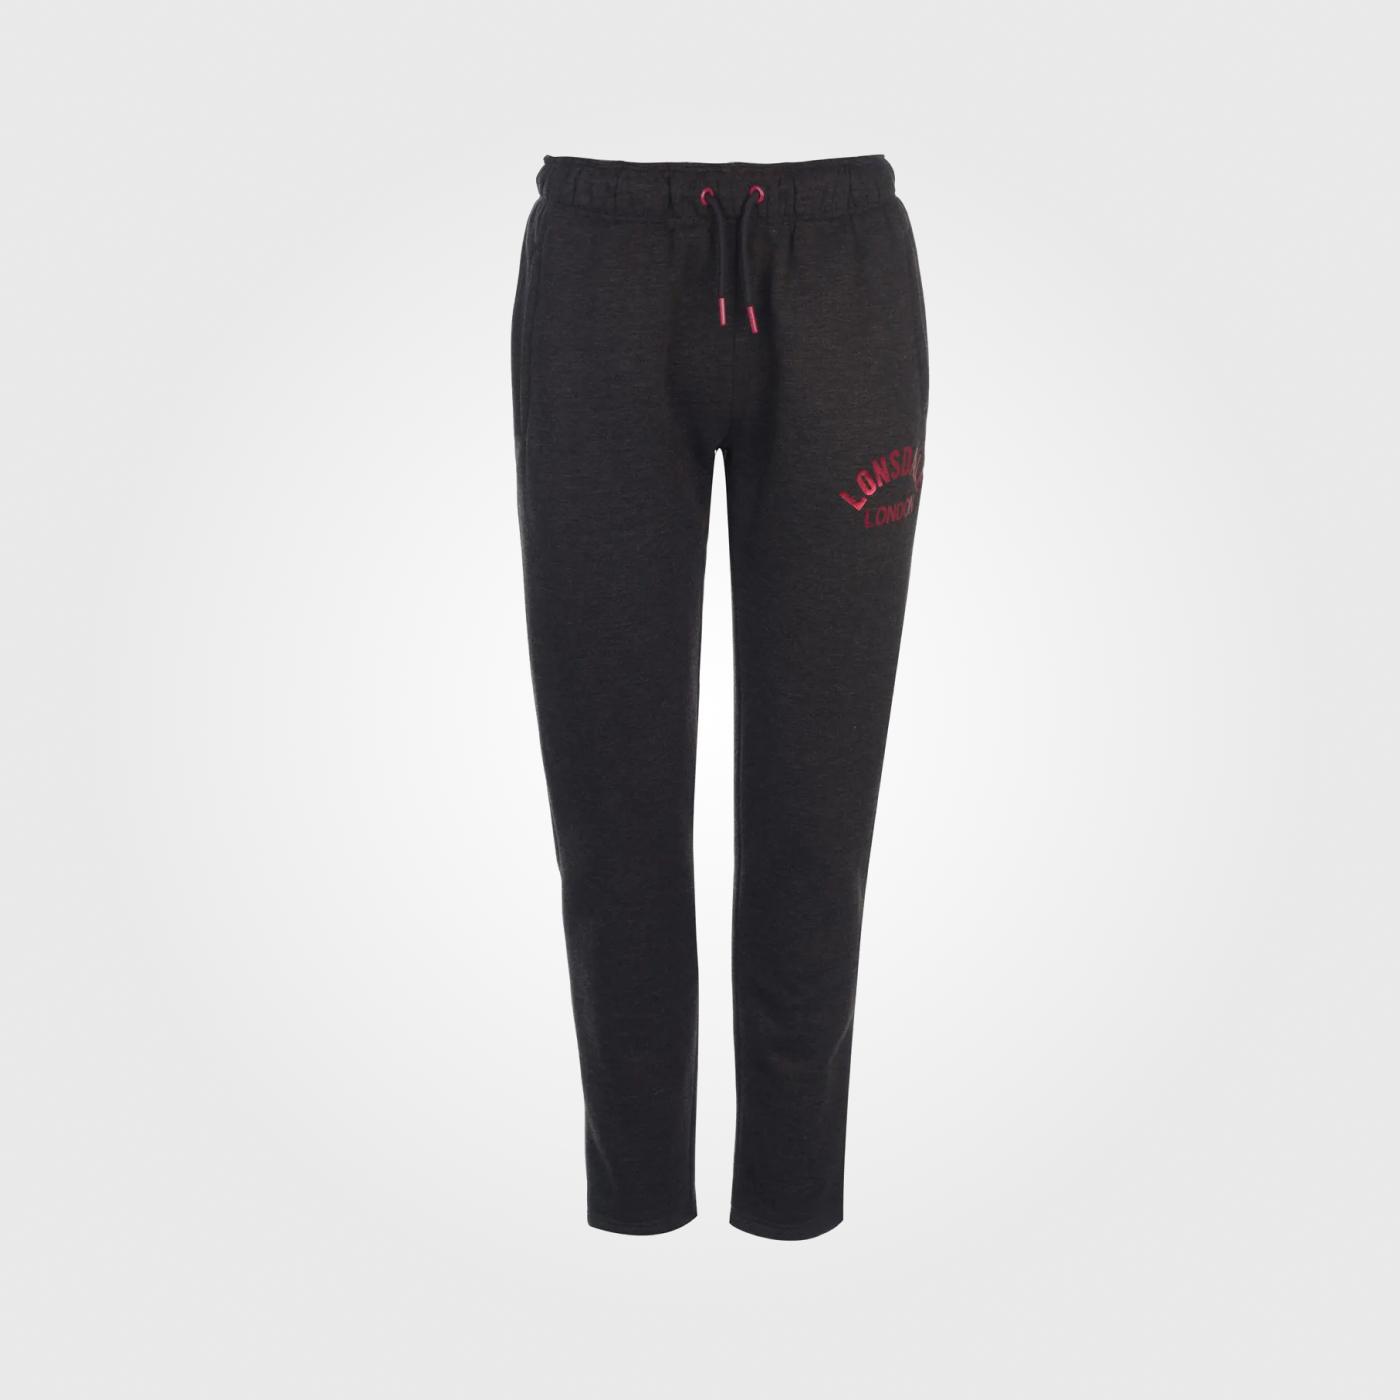 Спортивные штаны Lonsdale Slim Open Hem Ladies Charcoal